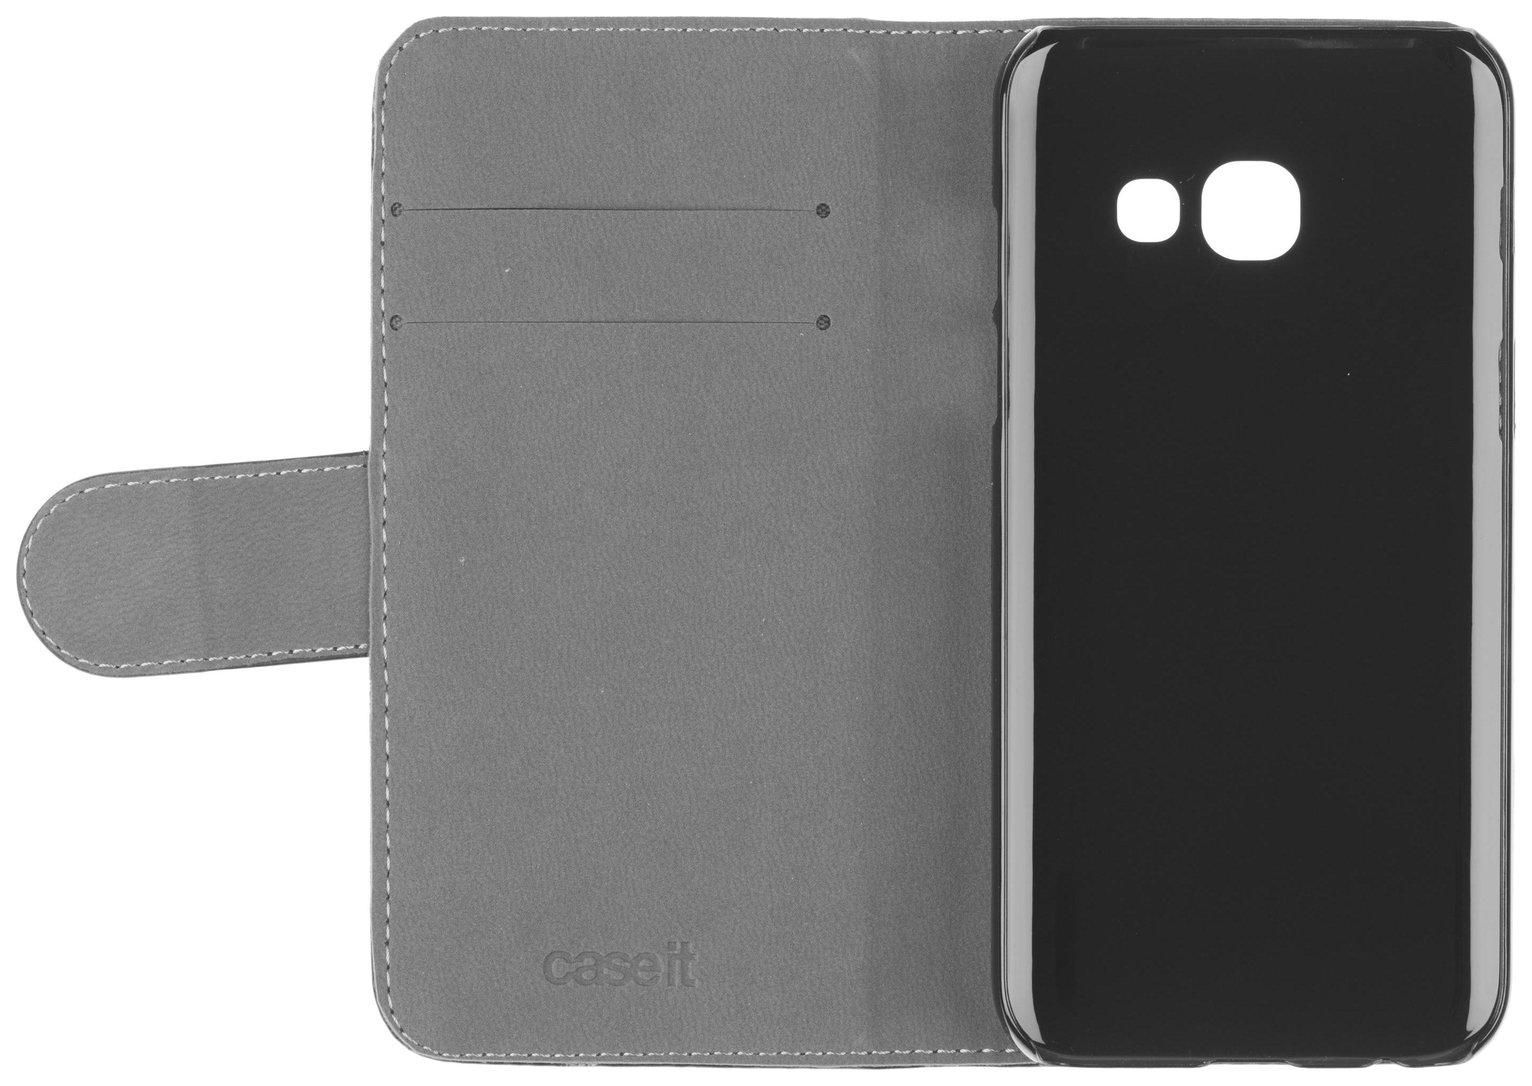 Case It Samsung Galaxy A3 Leather Folio Phone Case - Black